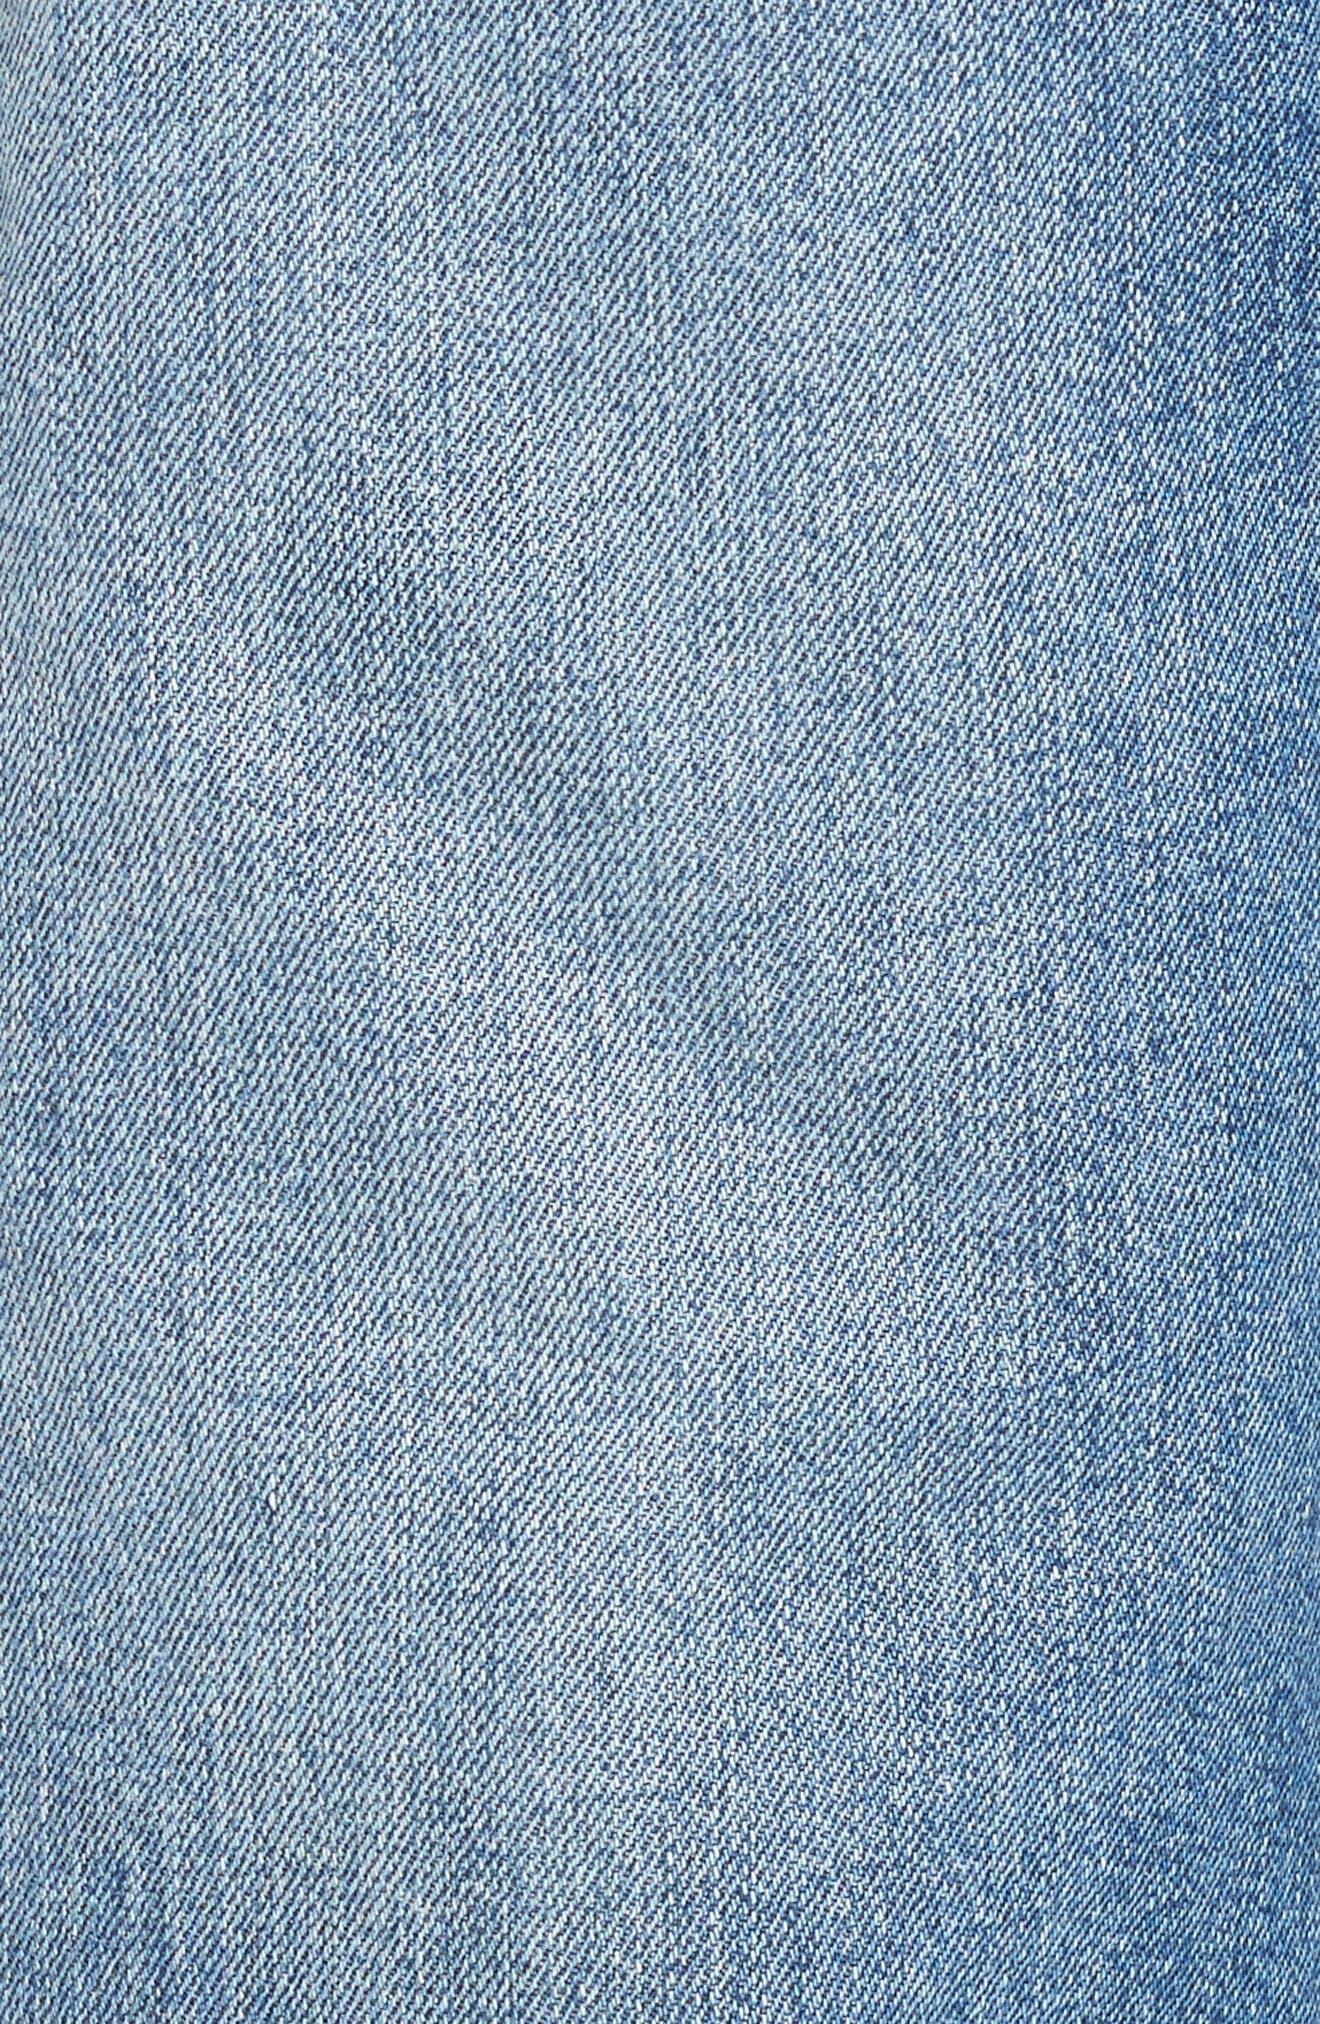 Barrel Jeans,                             Alternate thumbnail 6, color,                             420